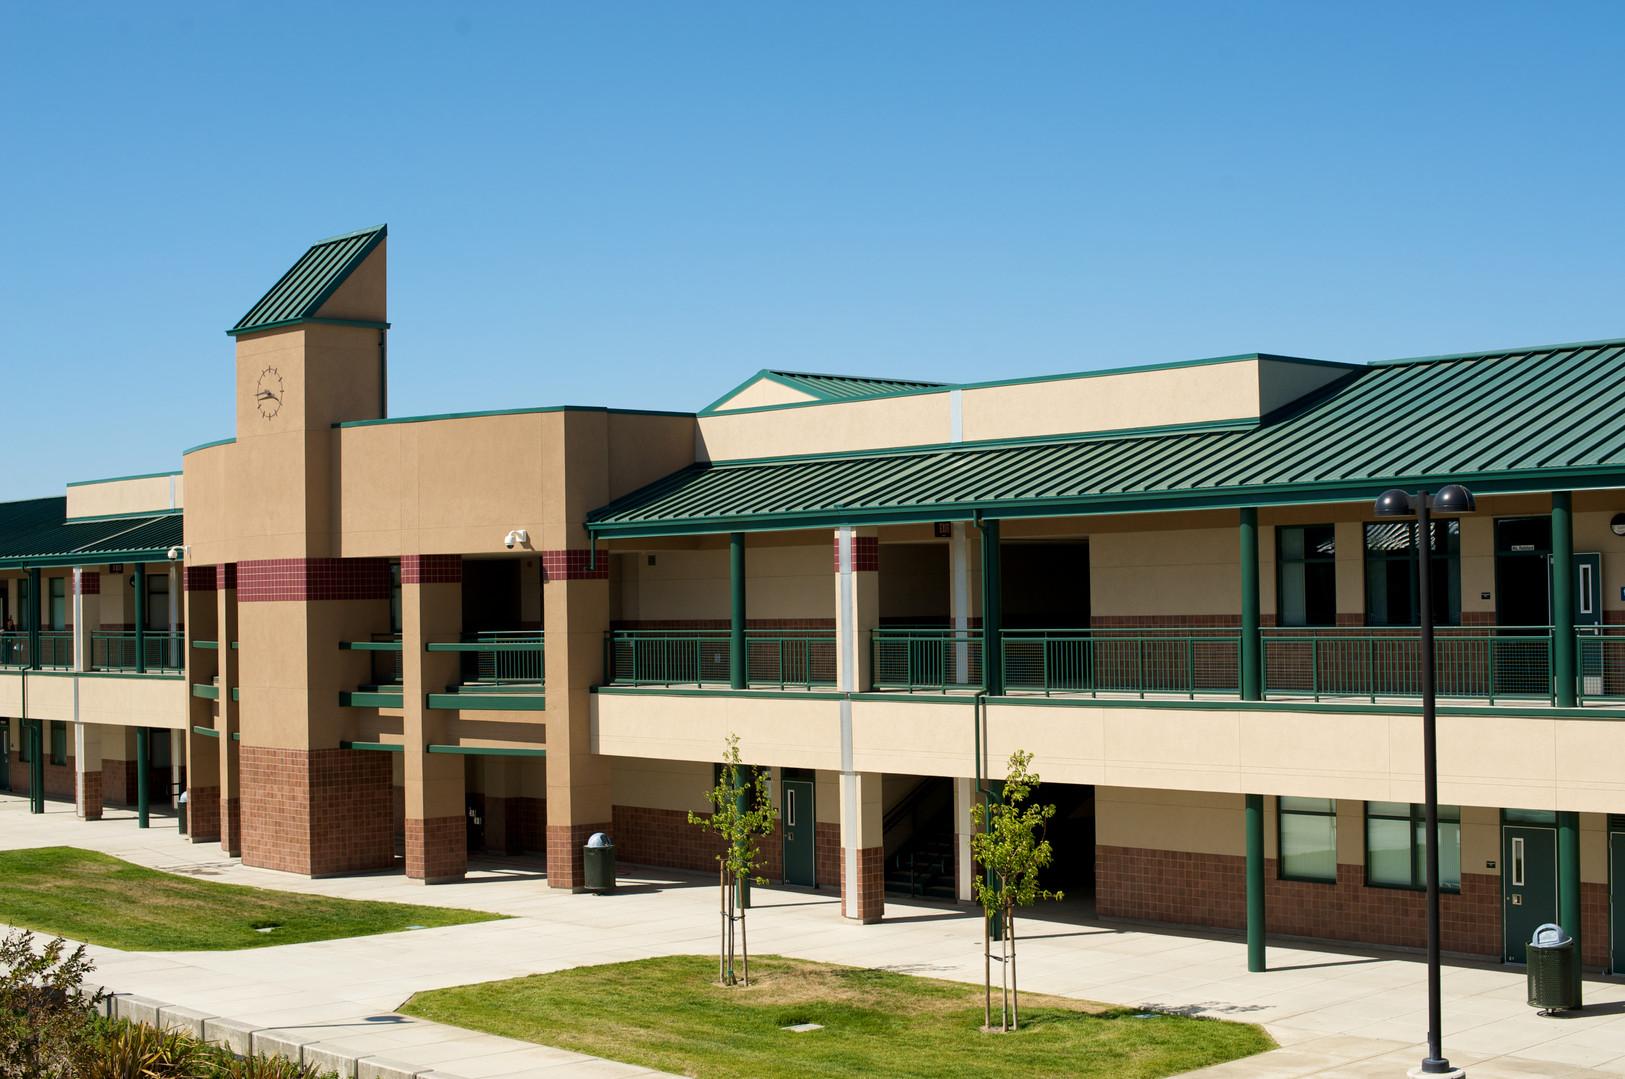 Range Road Junior High School Courtyard